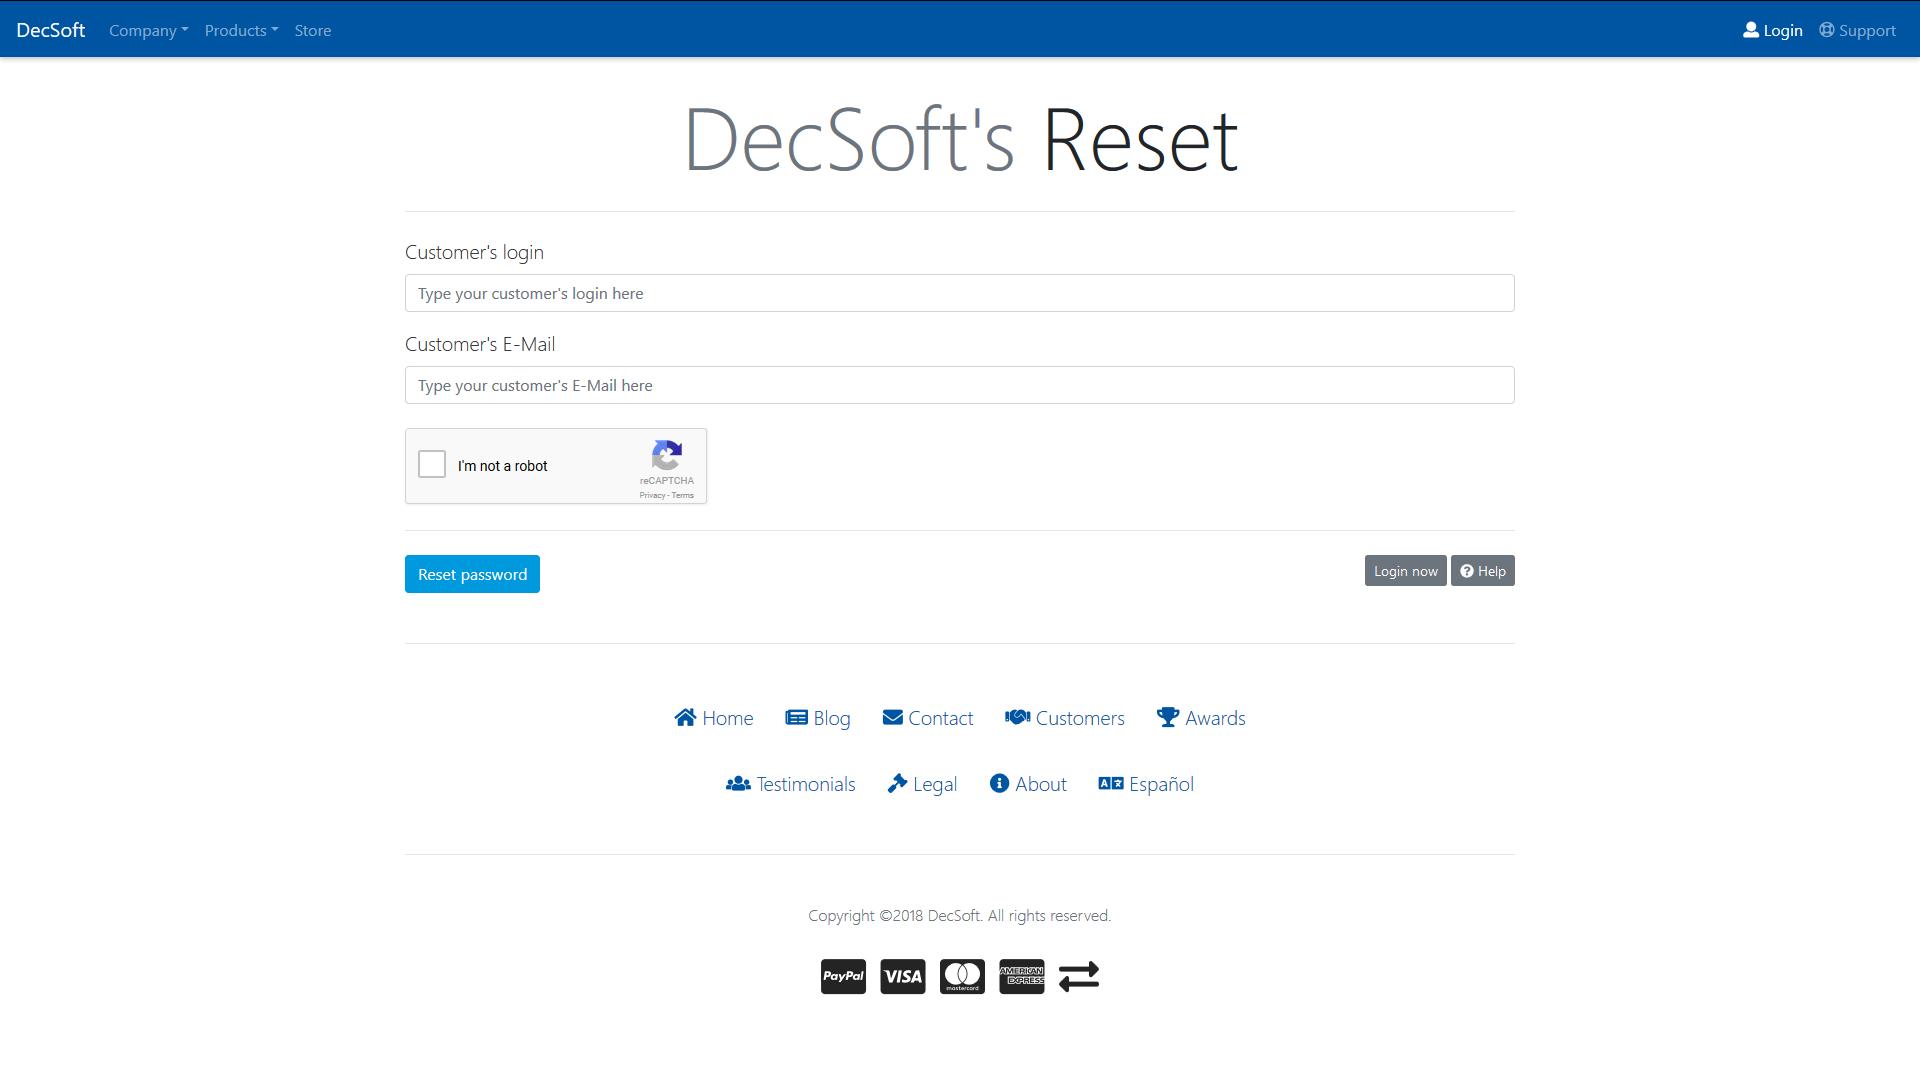 The DecSoft's customer's login form